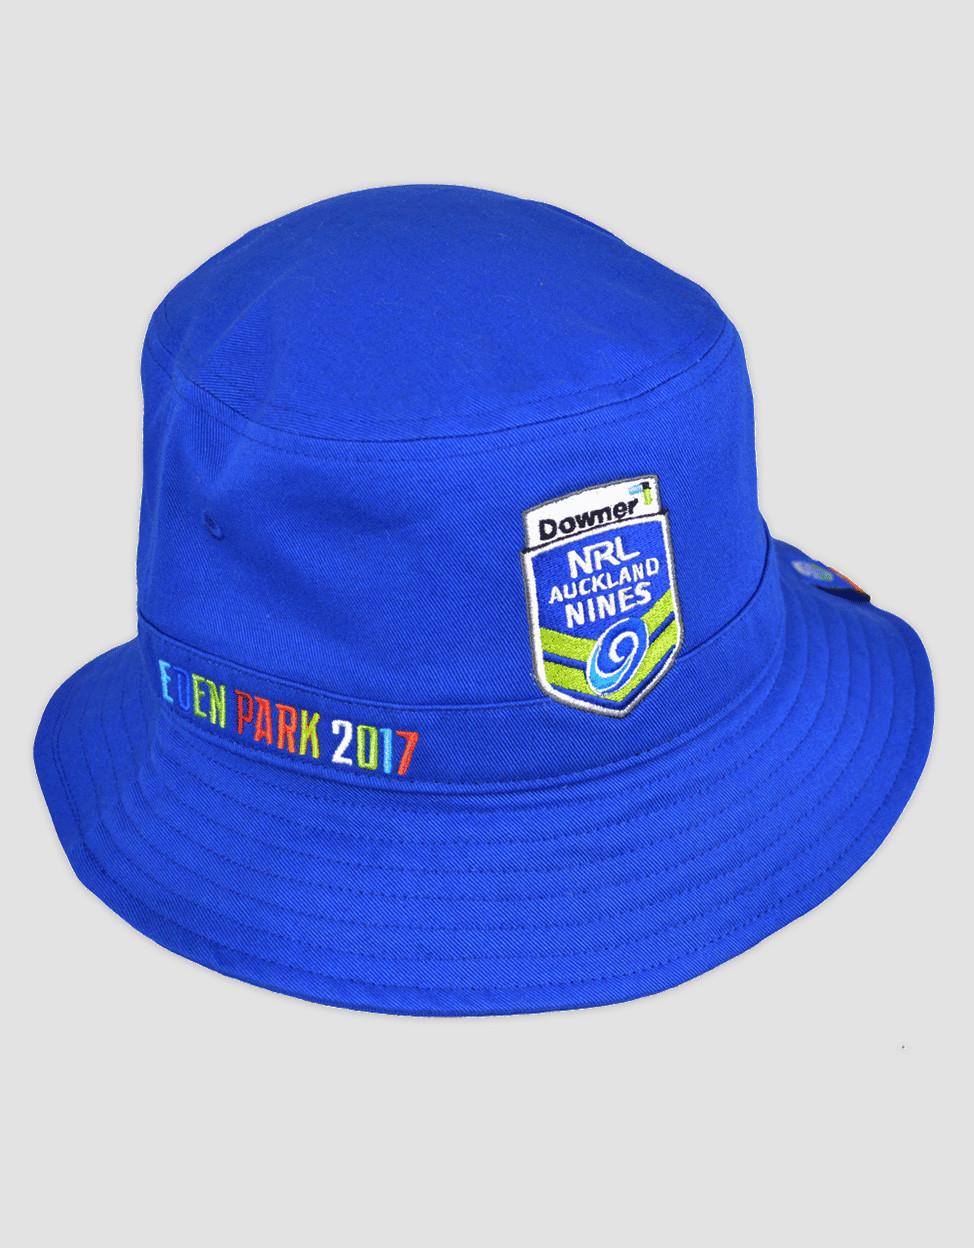 2017 Auckland Nines Bucket Hat Playbill Nz